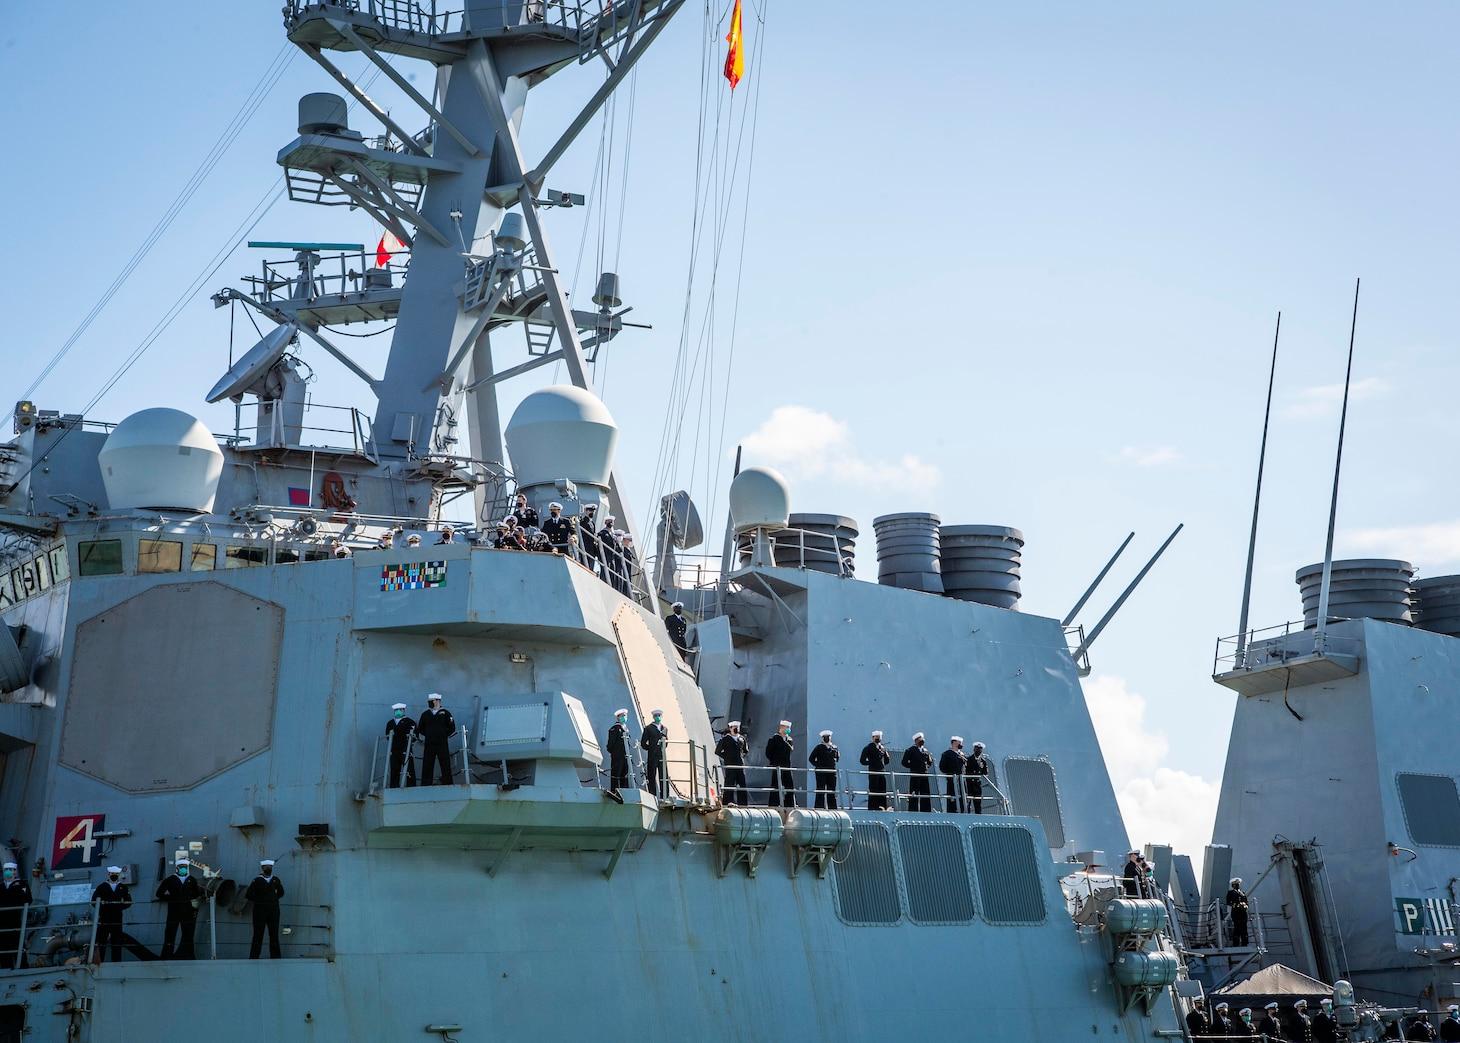 The Arleigh Burke-class guided-missile destroyer, USS Arleigh Burke (DDG 51), arrives at Naval Station (NAVSTA) Rota, Apr. 11, 2021.